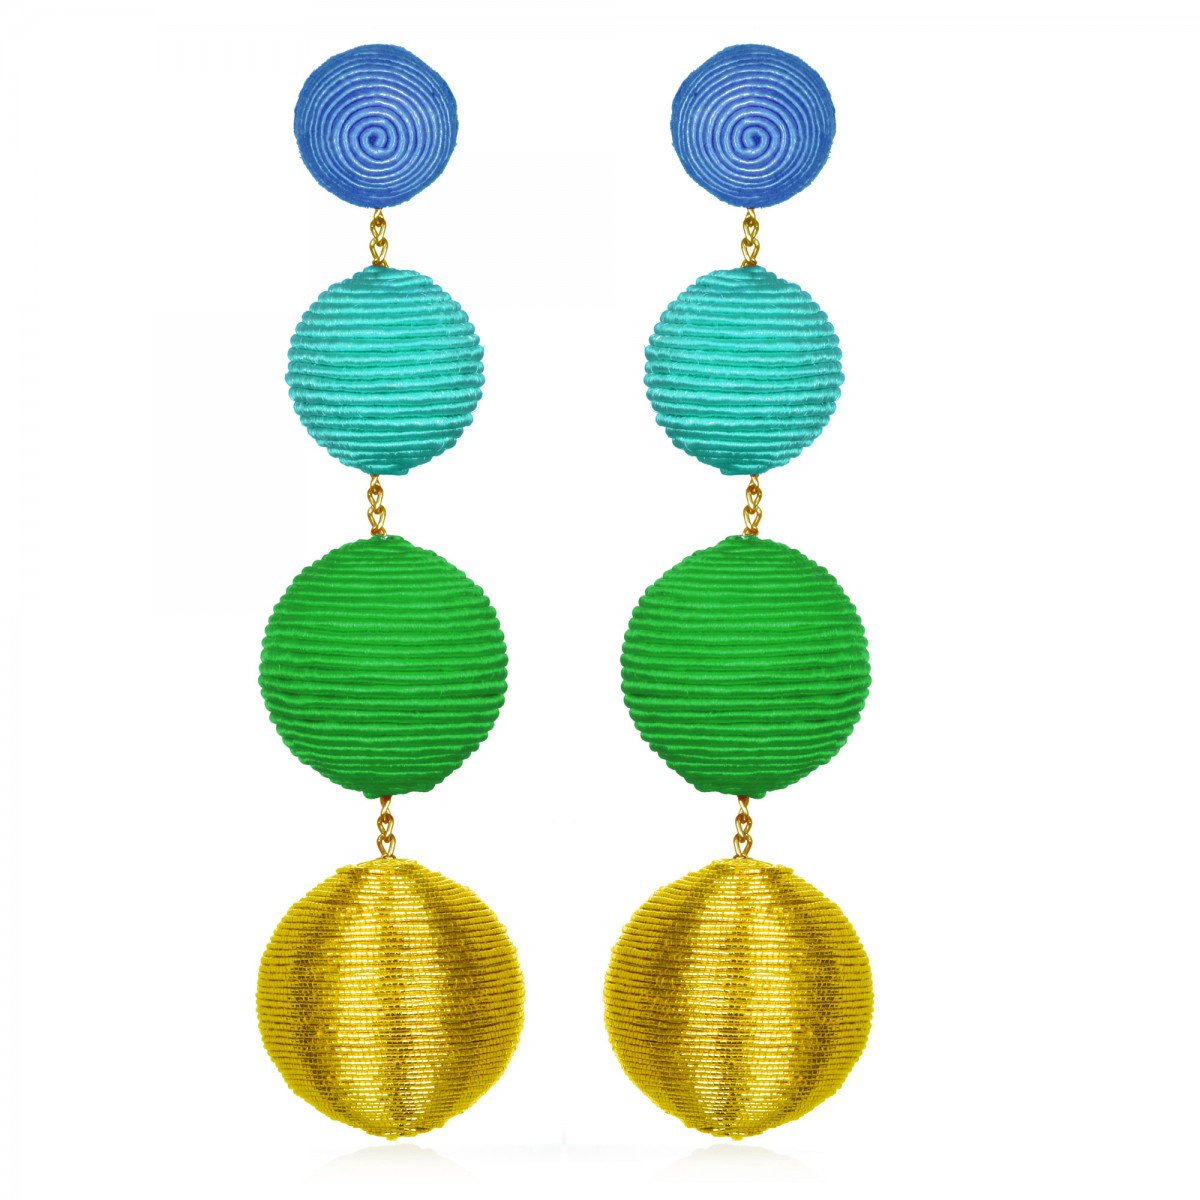 Metallic Gumball Earrings by SUZANNA DAI